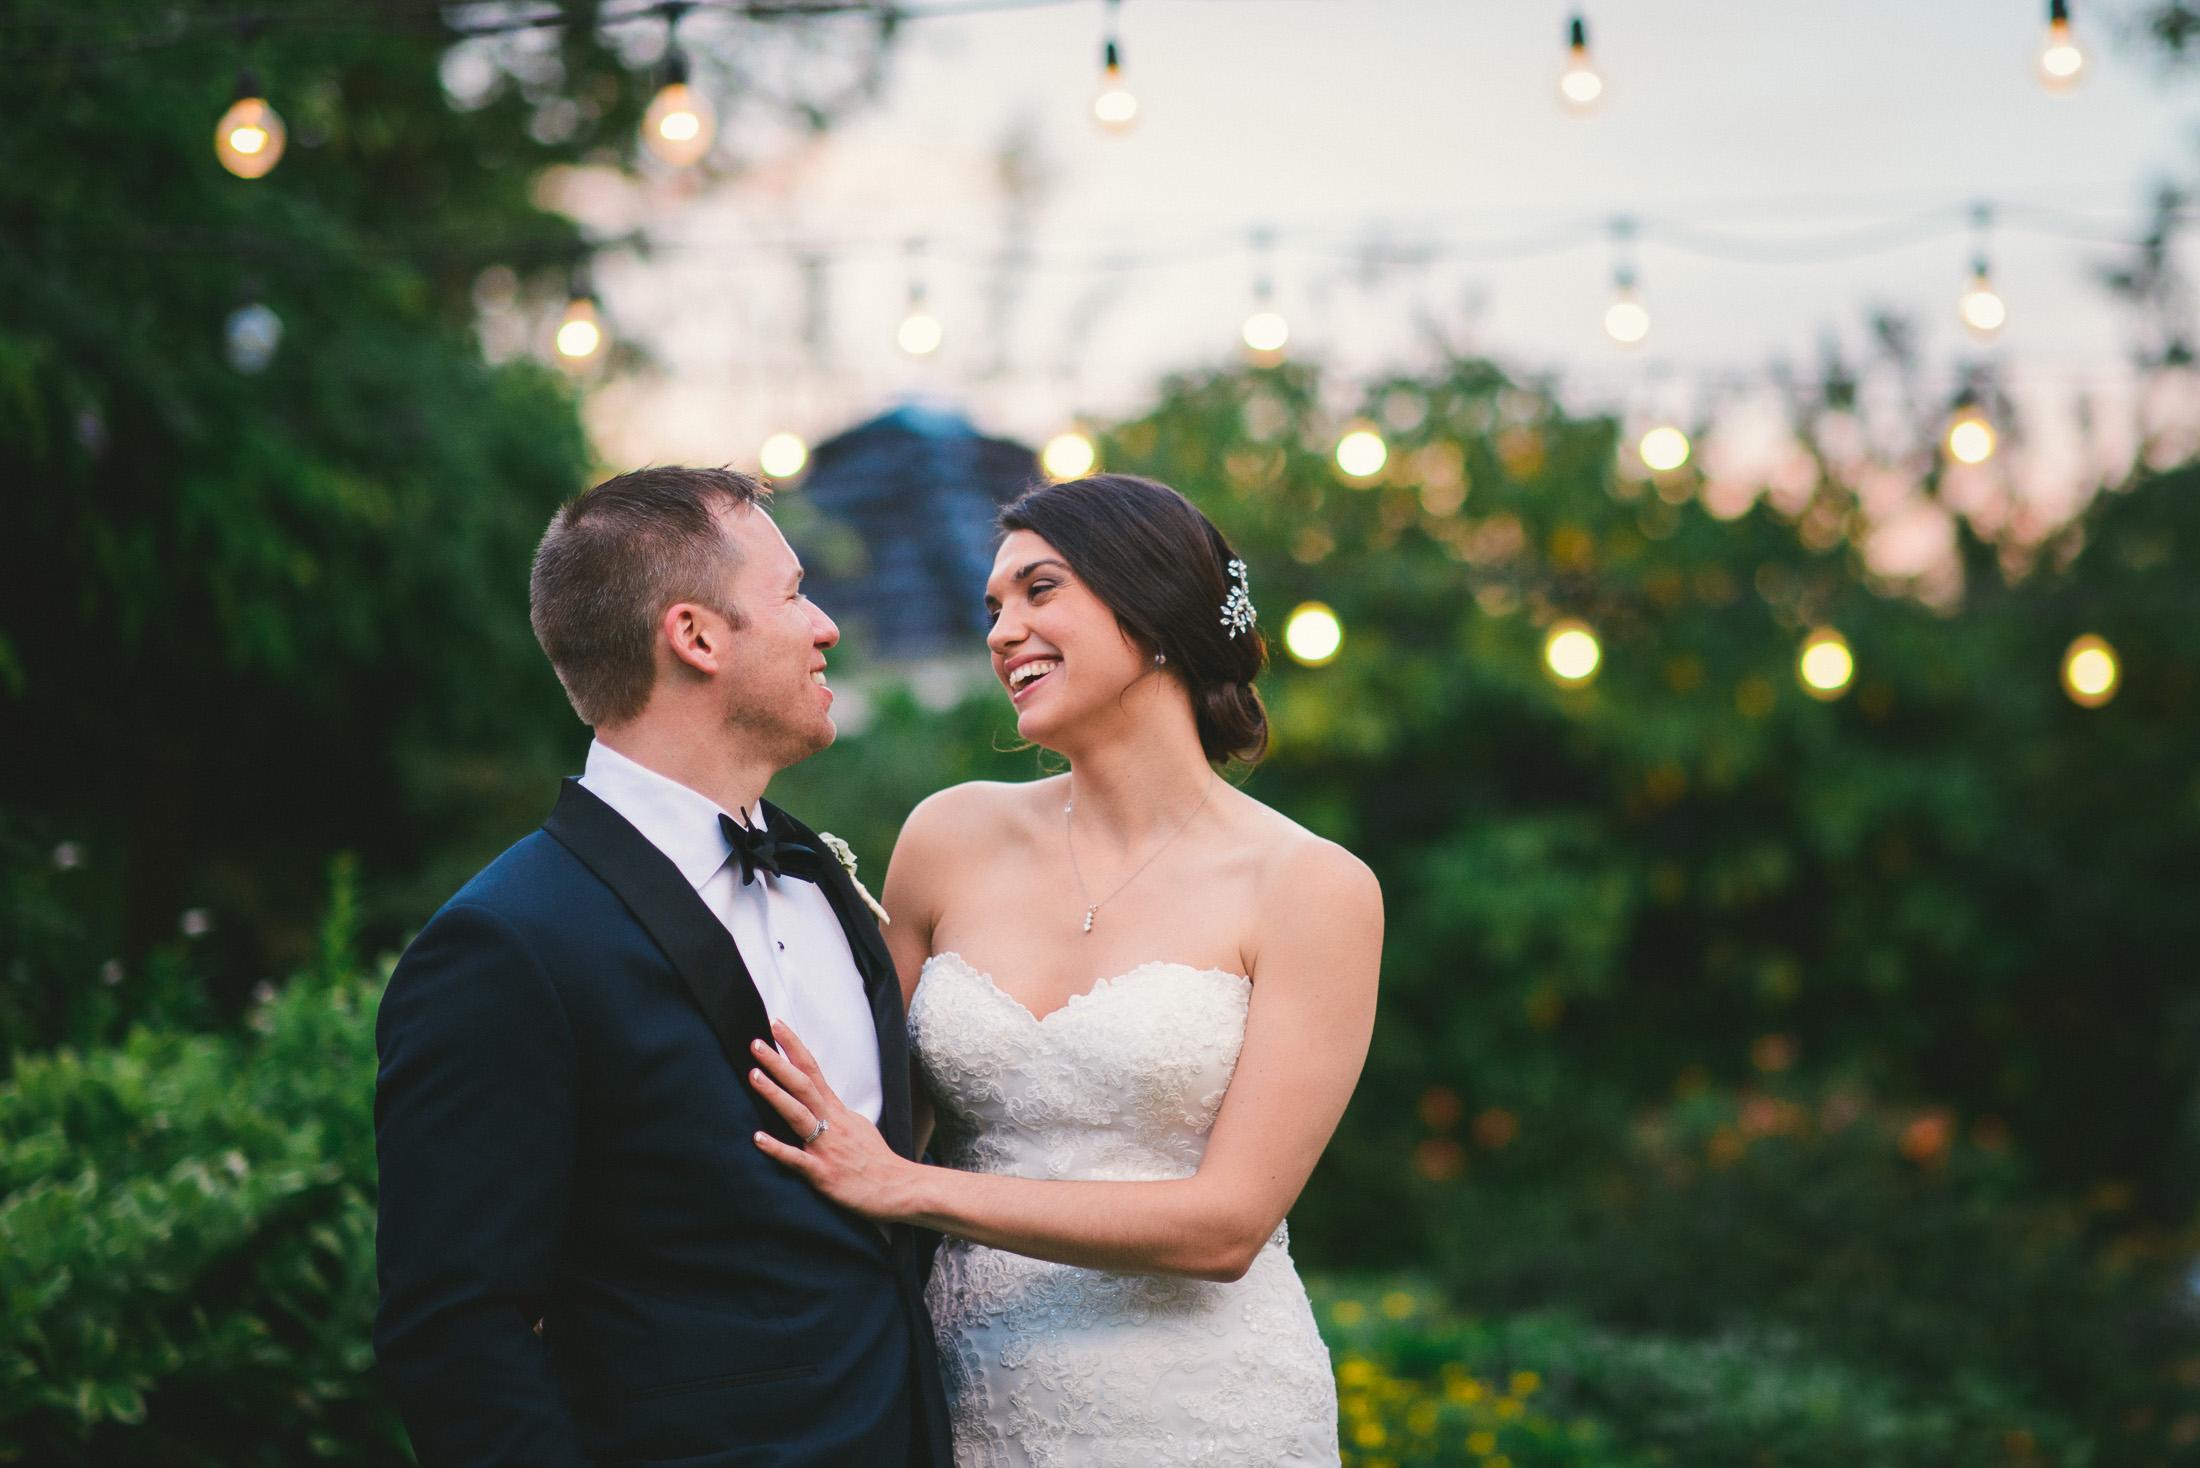 NH Wedding Photographer: couple under lights